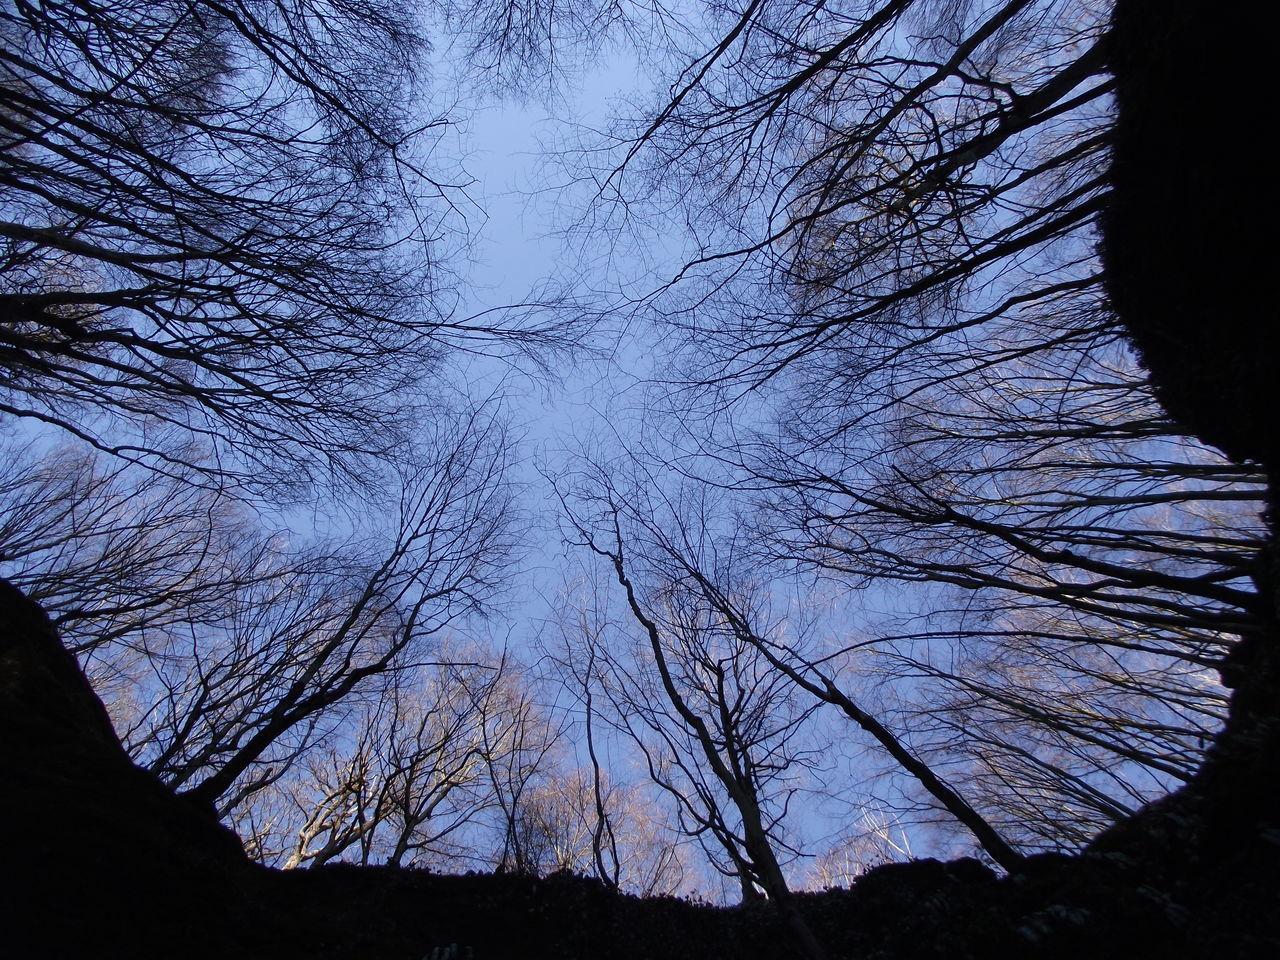 Bare Tree Beauty In Nature Branch Bükk Hungary Nature No People Sky Tranquility Tree